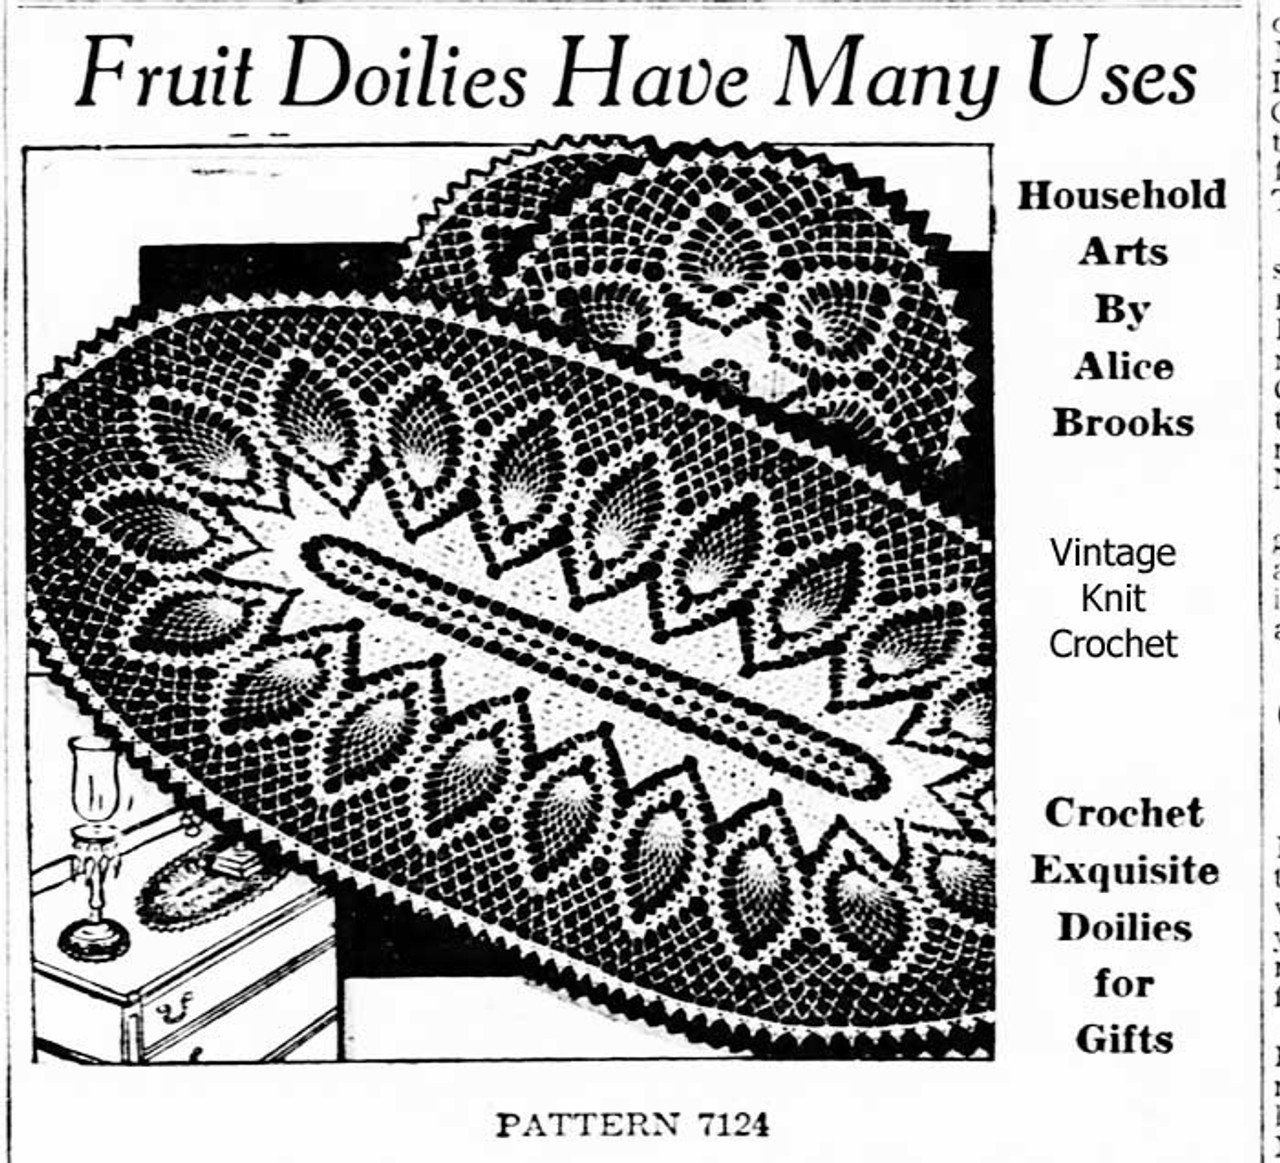 Crochet Oval Pineapple Doily or Scarf Pattern, Alice Brooks 7124